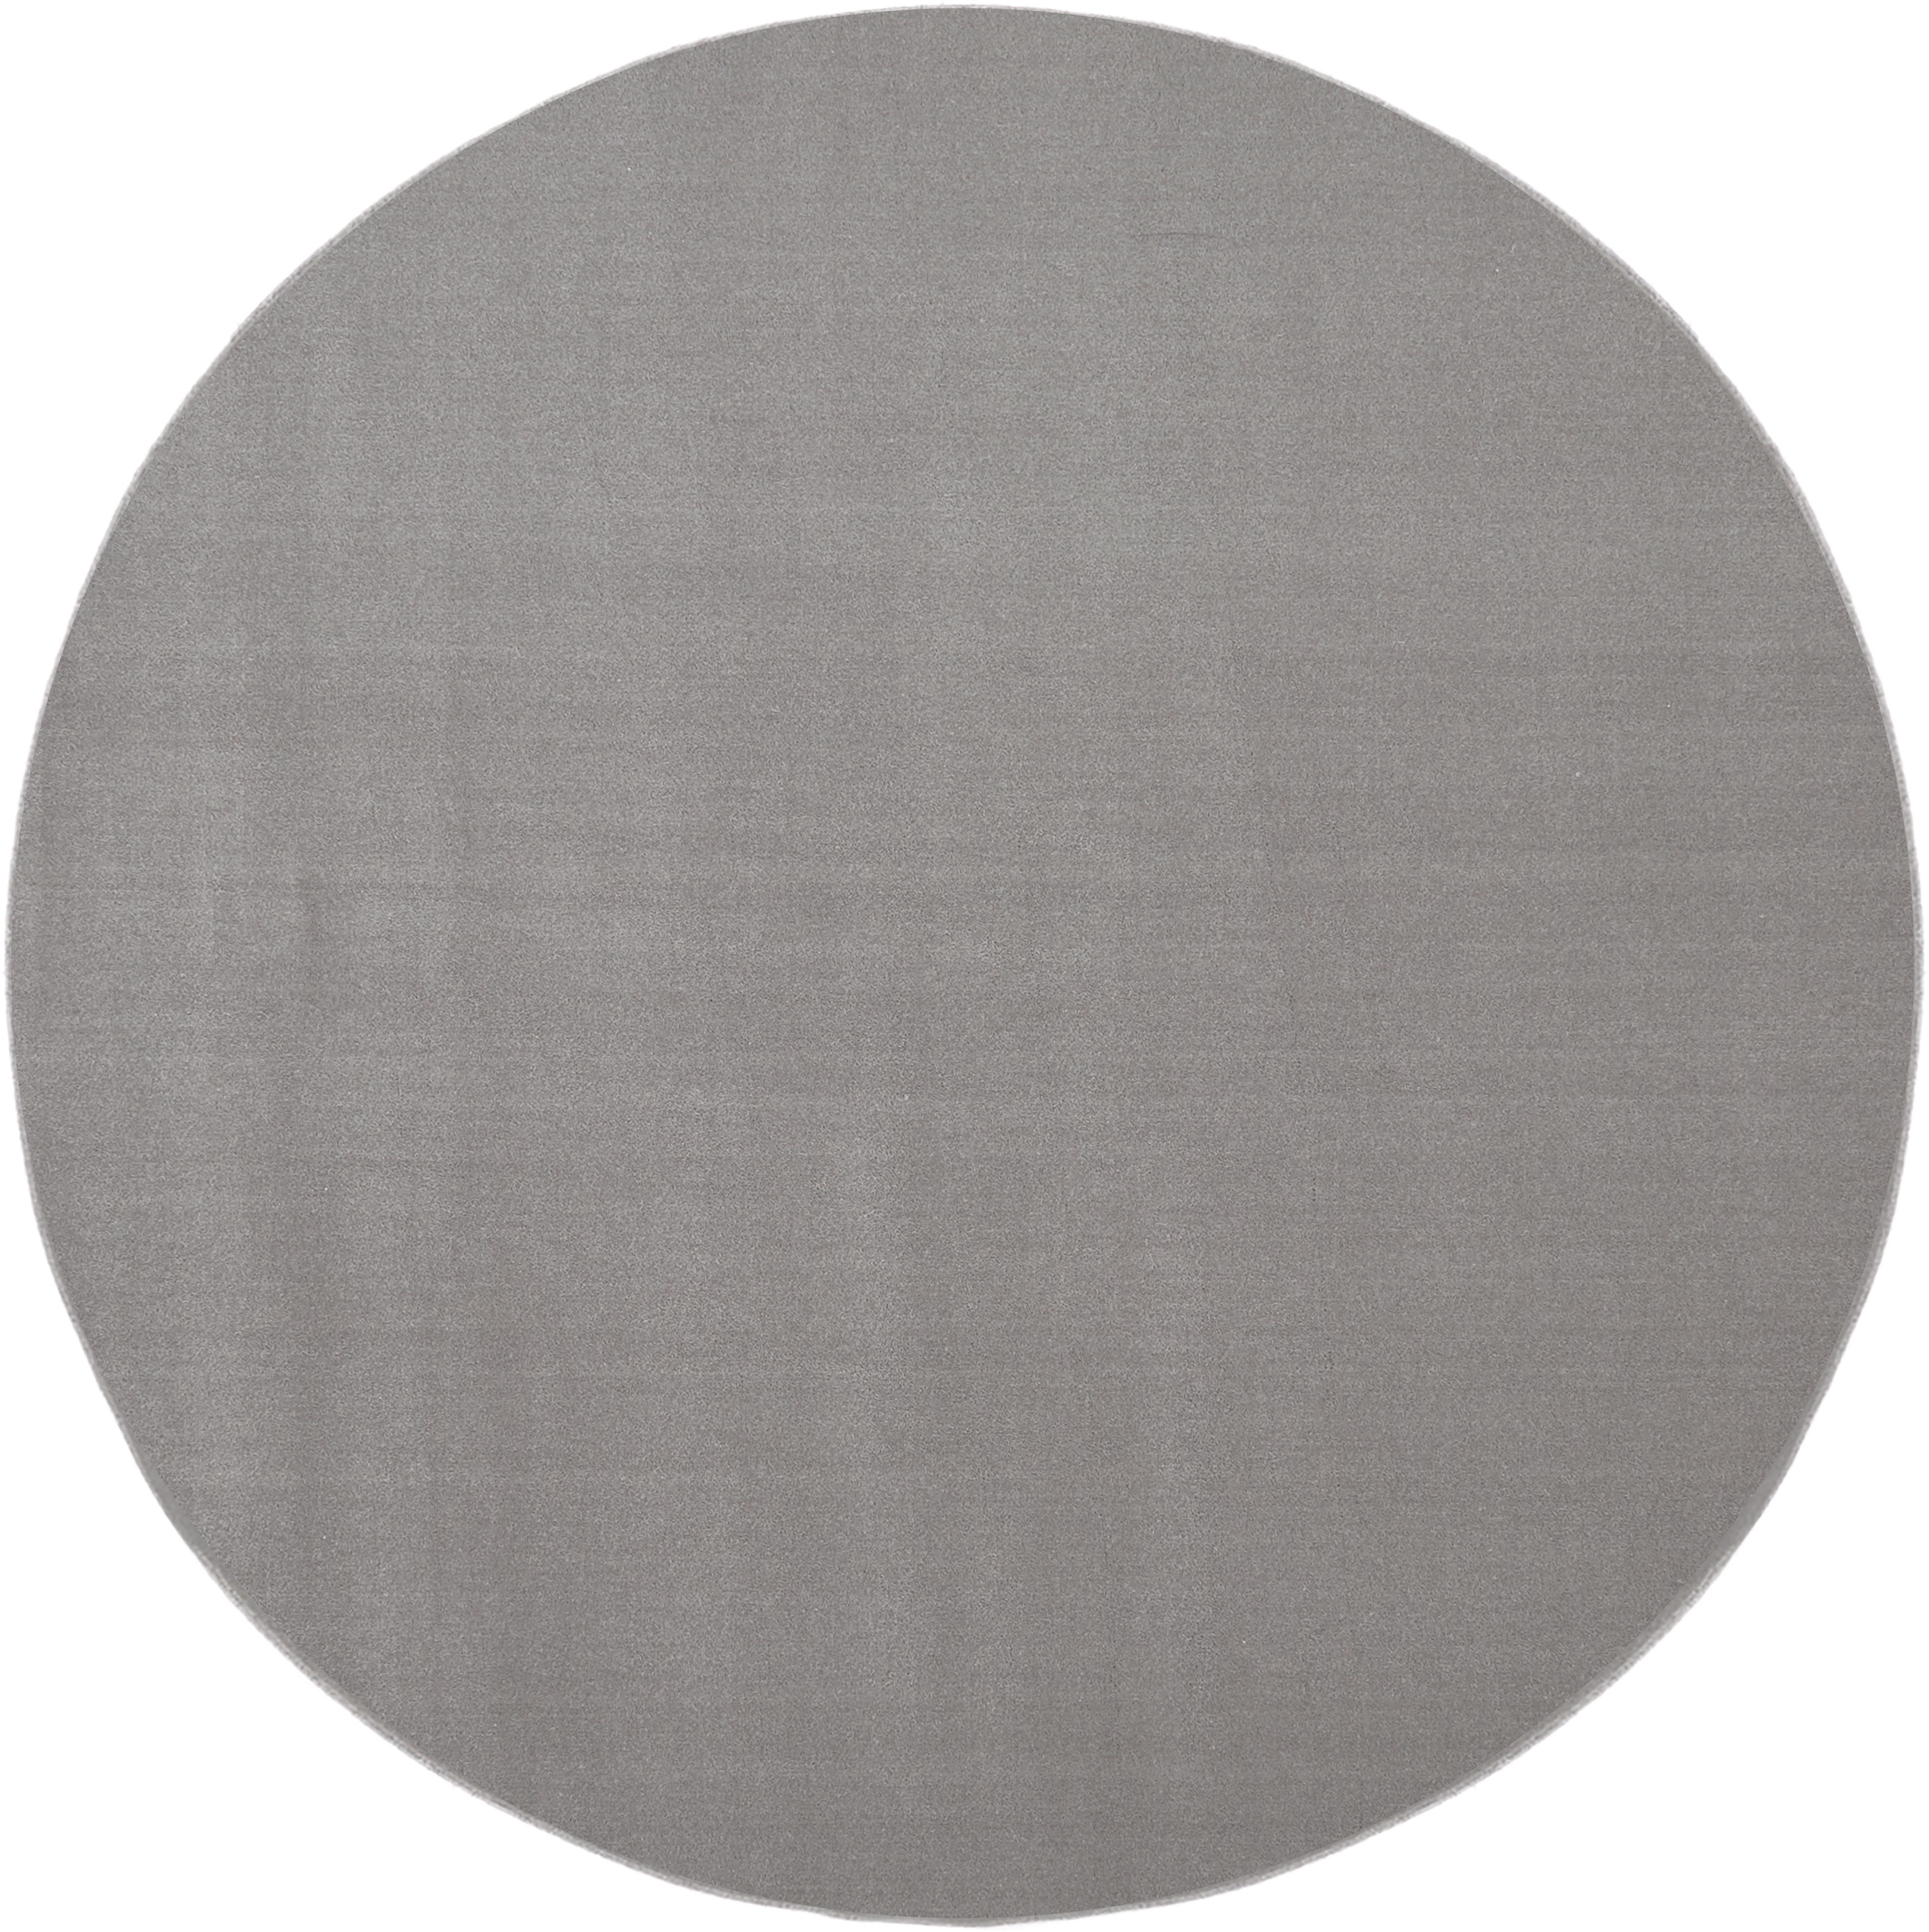 Runder Wollteppich Ida in Grau, Flor: 100% Wolle, Grau, Ø 120 cm (Grösse S)